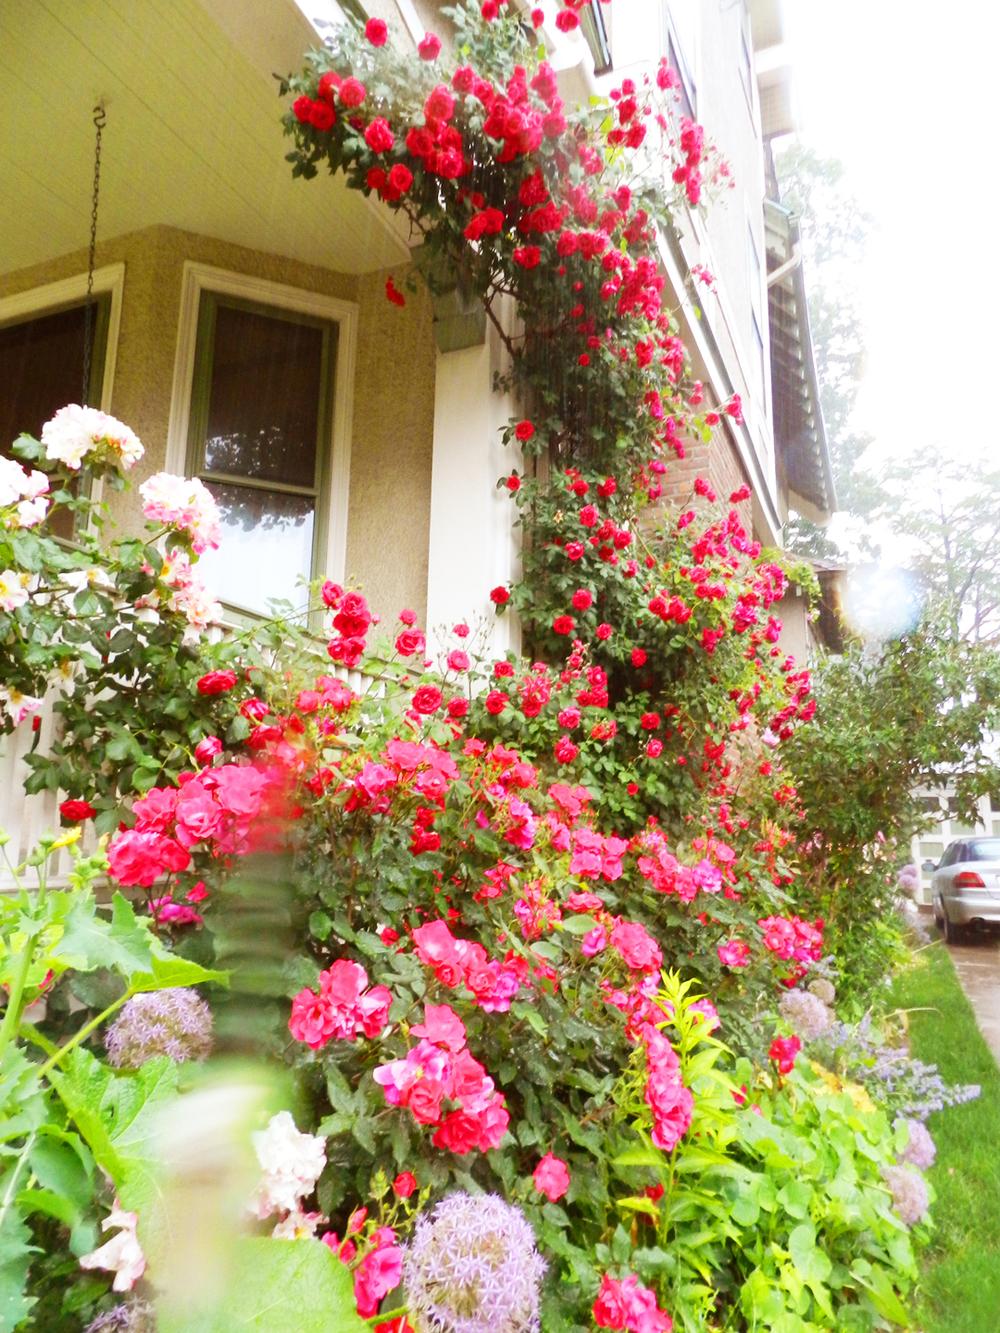 jed cutler spring roses 2013 007.JPG